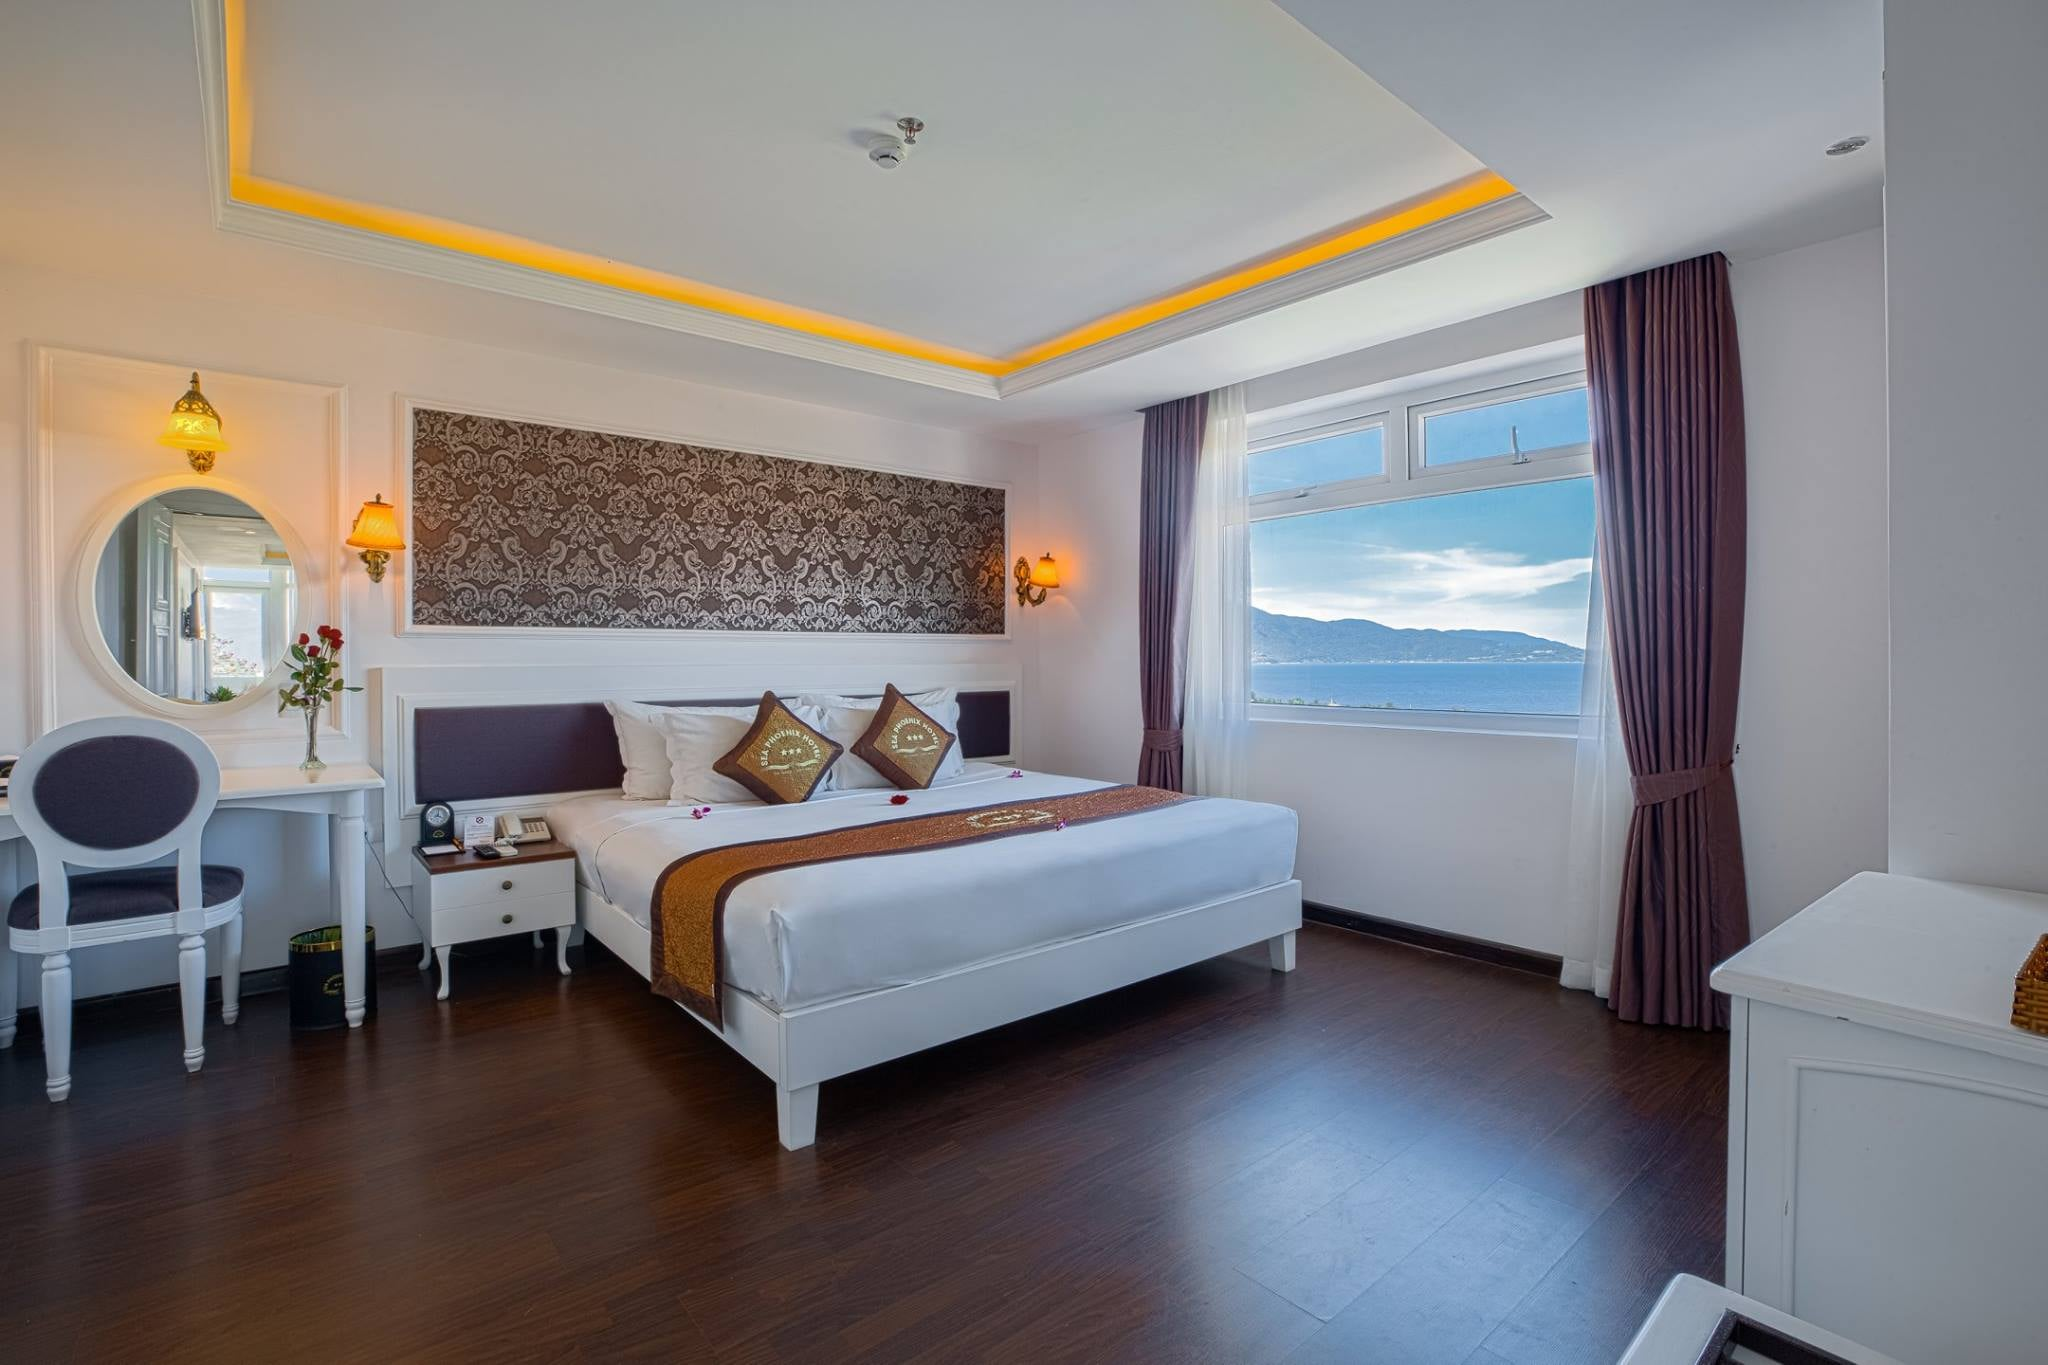 sea phoenix Hotel khach san o da nang gan bien my khe